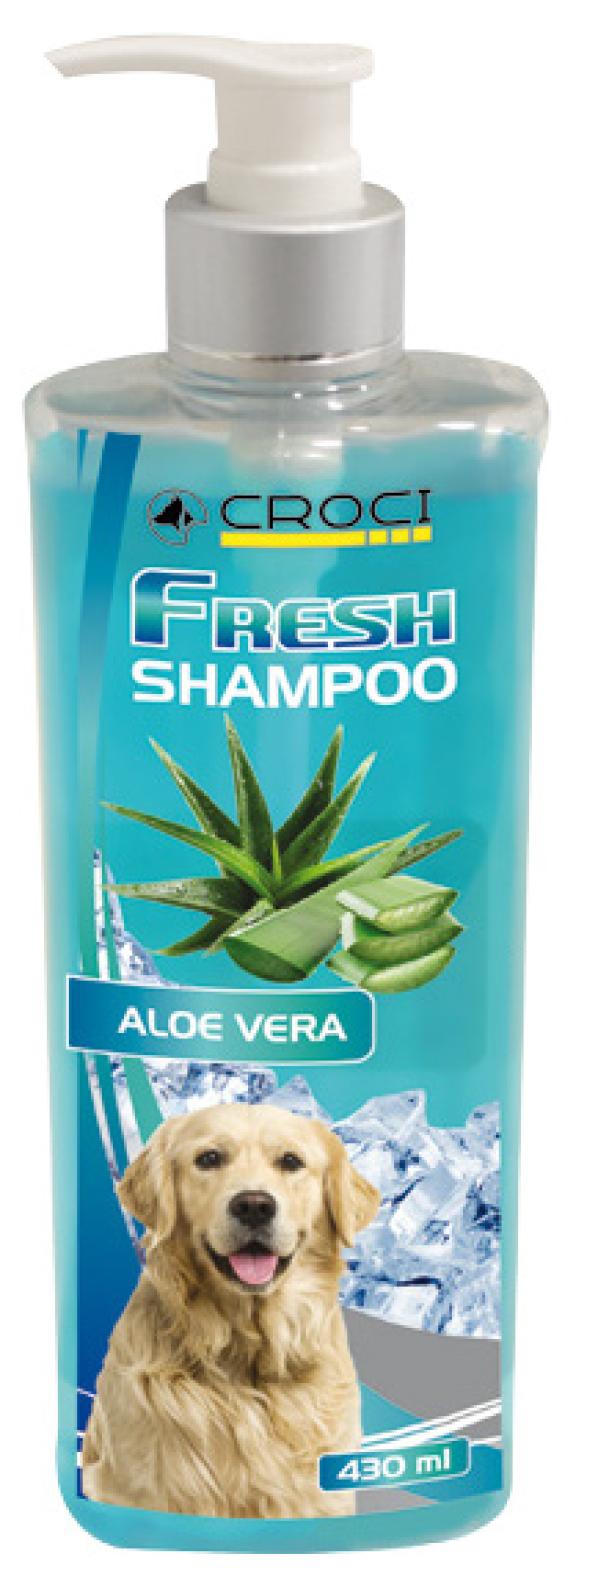 Image of Gill's Shampoo Fresh Aloe 430 ml 9018441